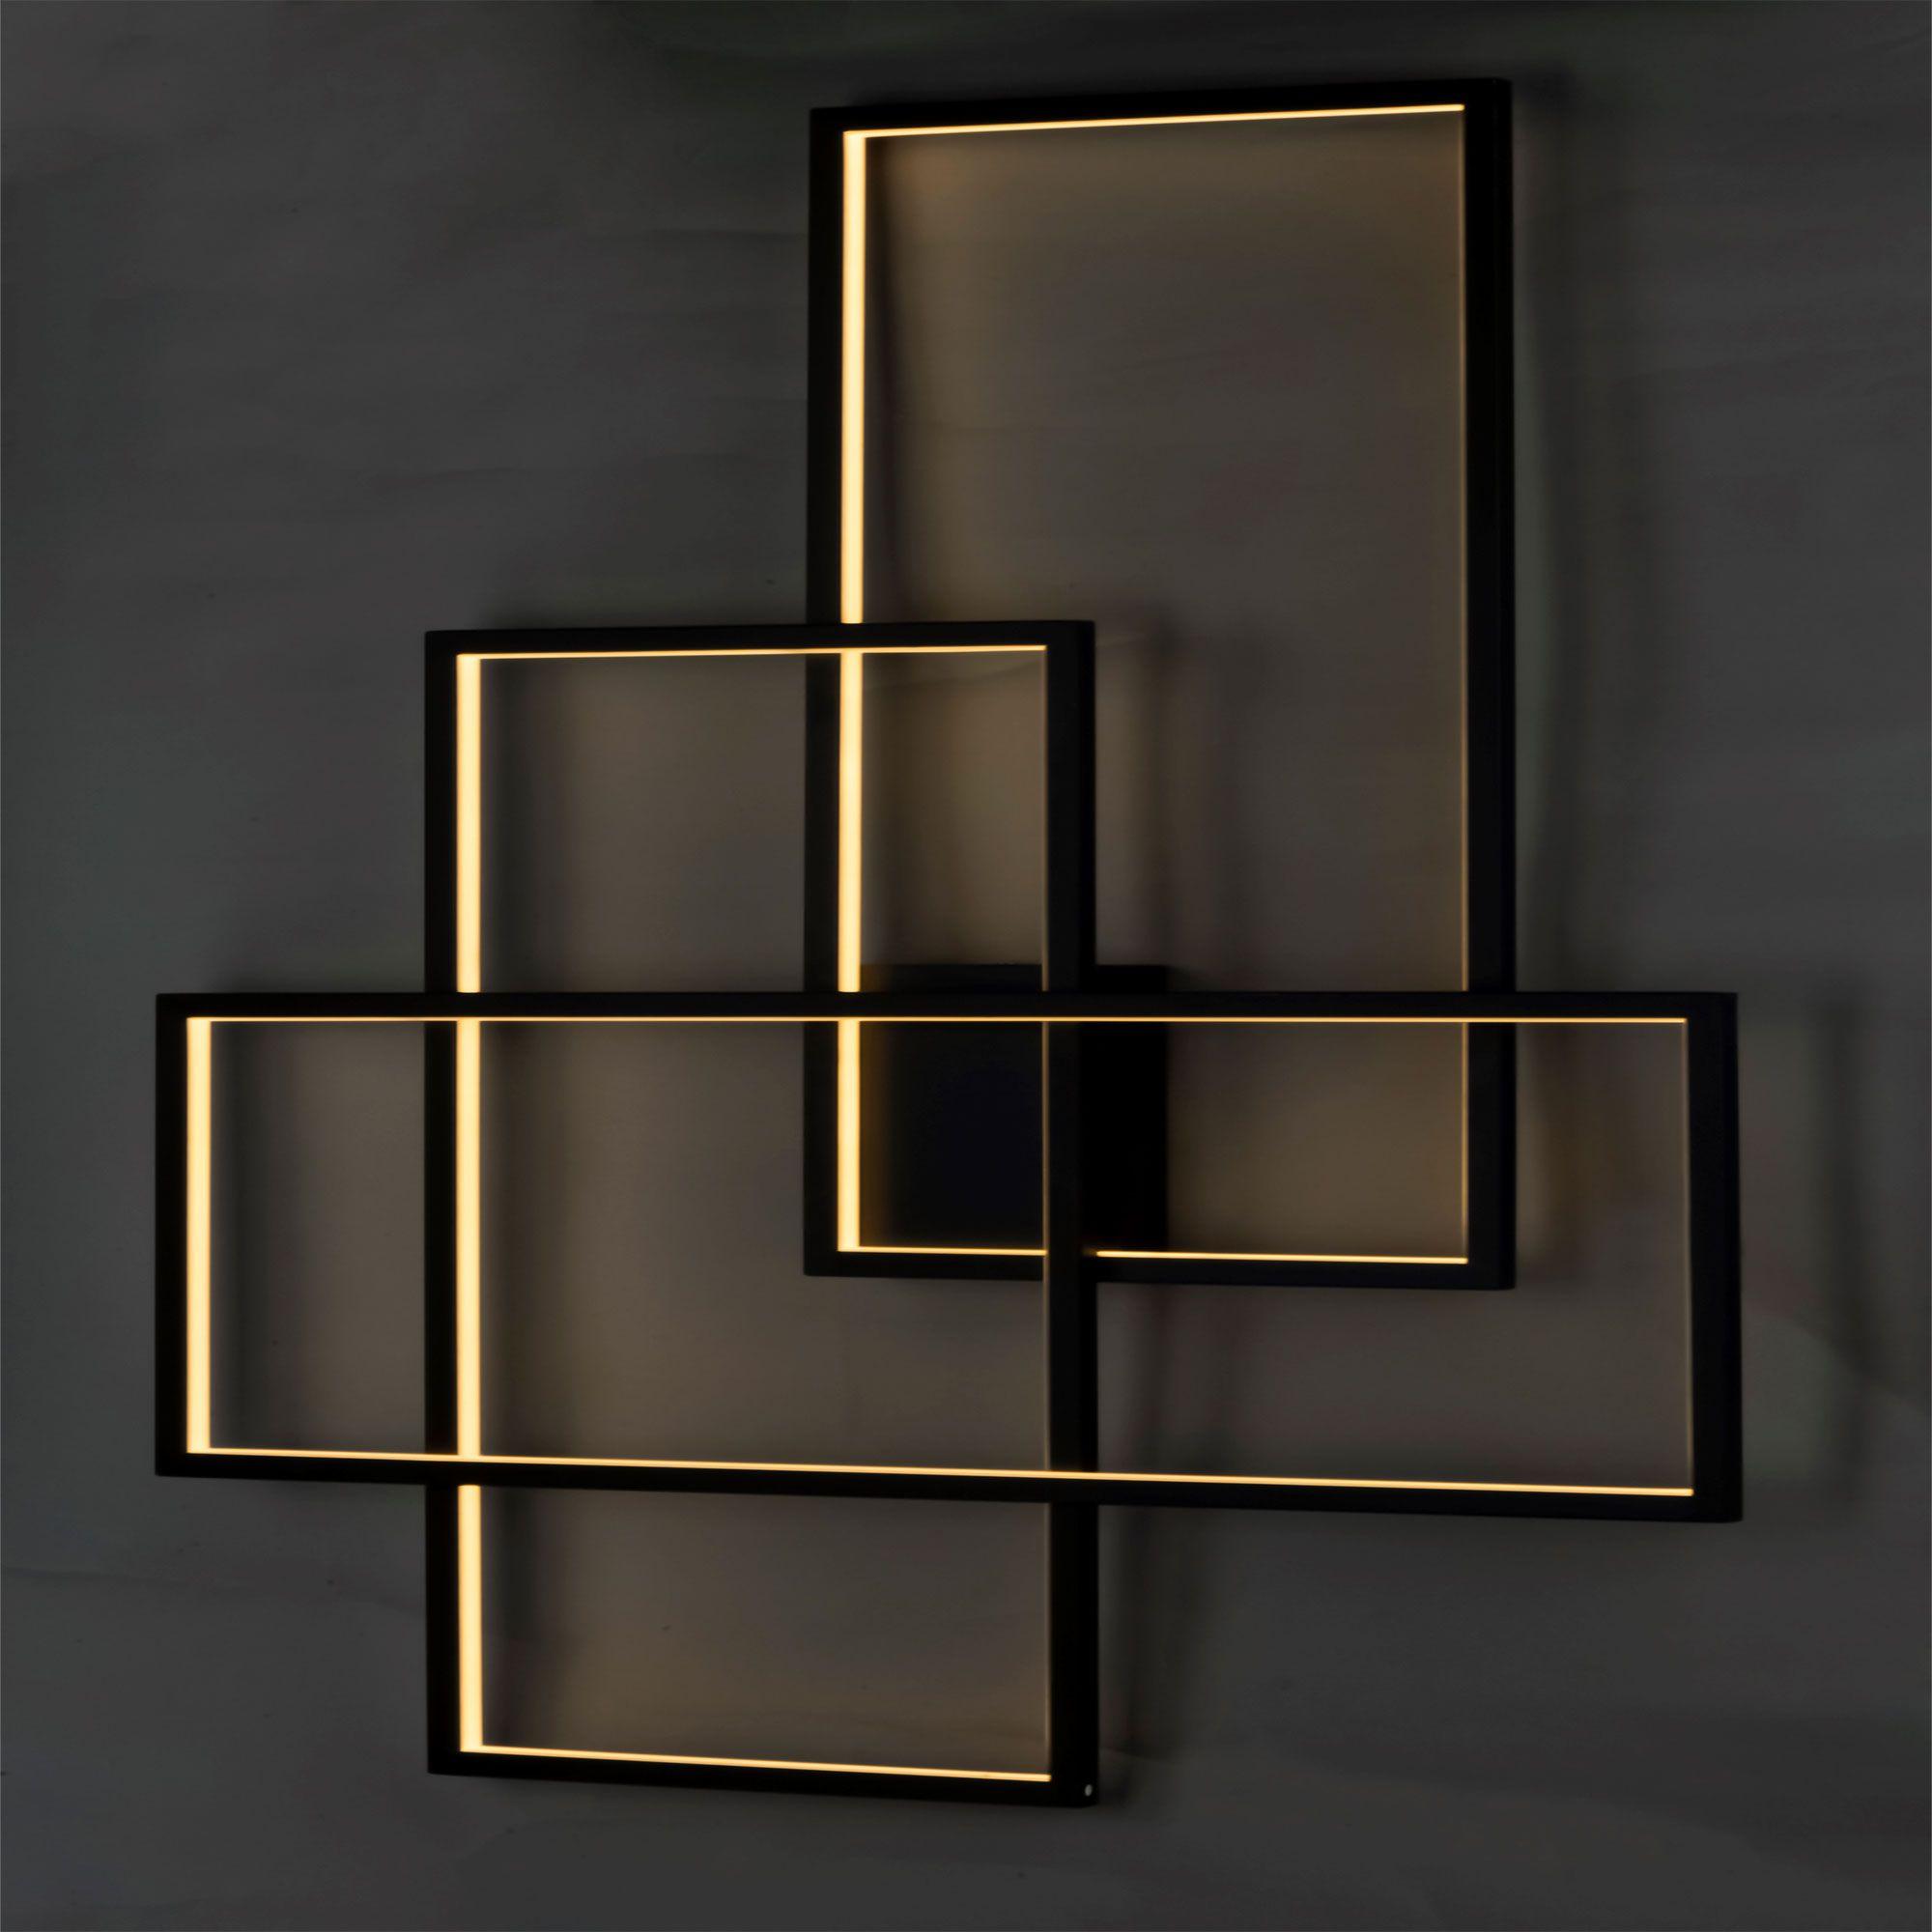 Converge Wall Light By Et2 E20708 Bk Wall Lighting Design Lighting Design Interior Led Wall Sconce